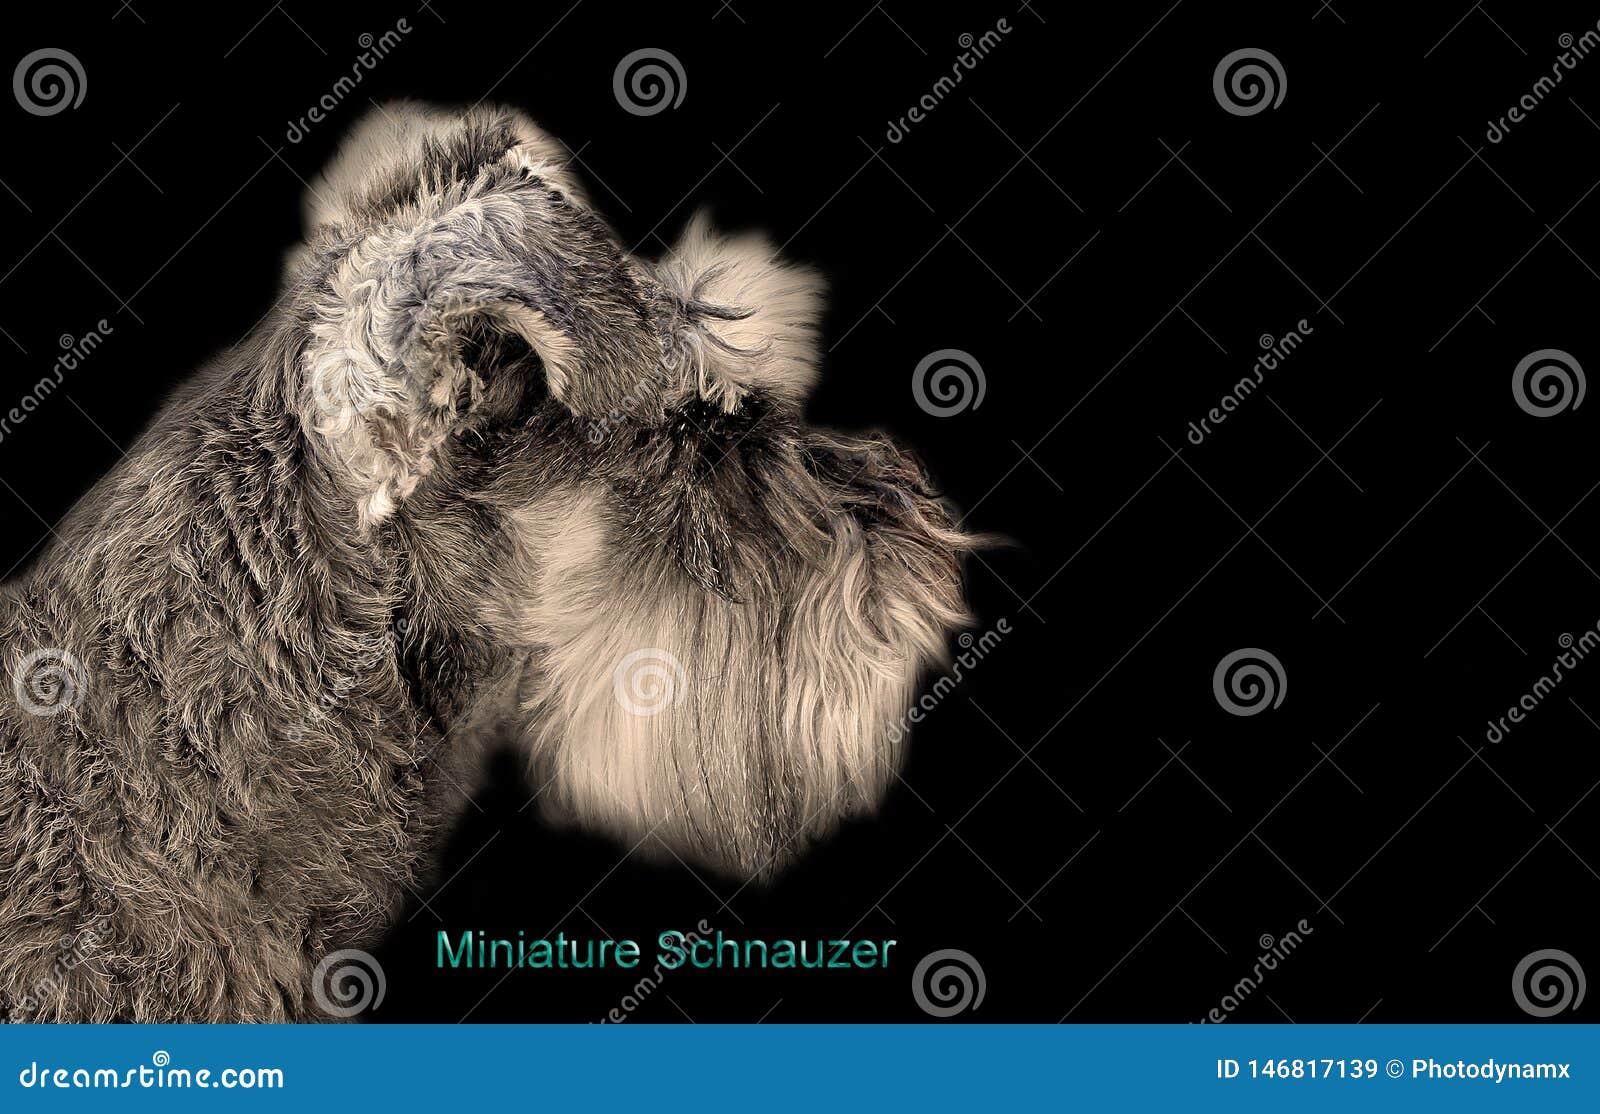 Pedigree miniature schnauzer dog business card isolated on black